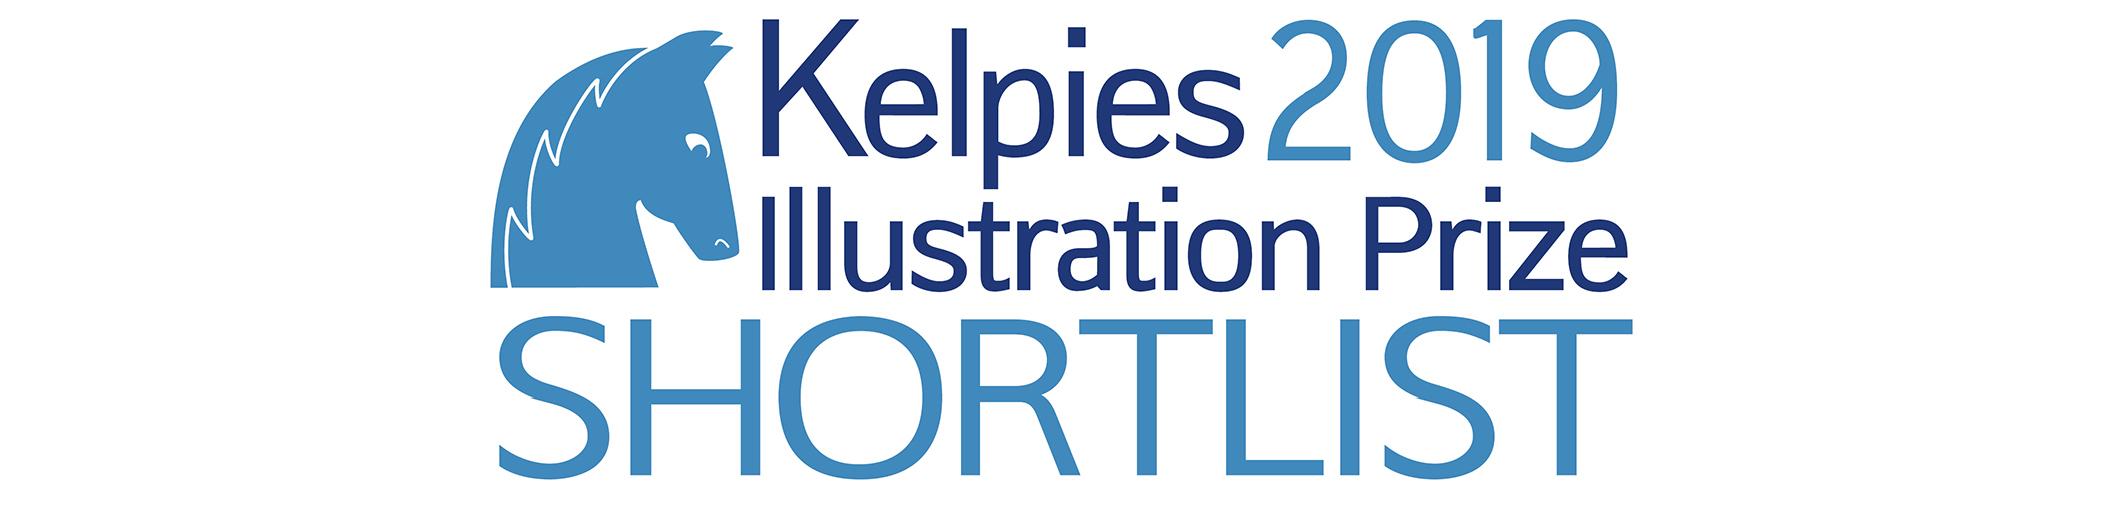 Kelpies Illustration Prize 2019 Shortlist Sticker Edit.jpg